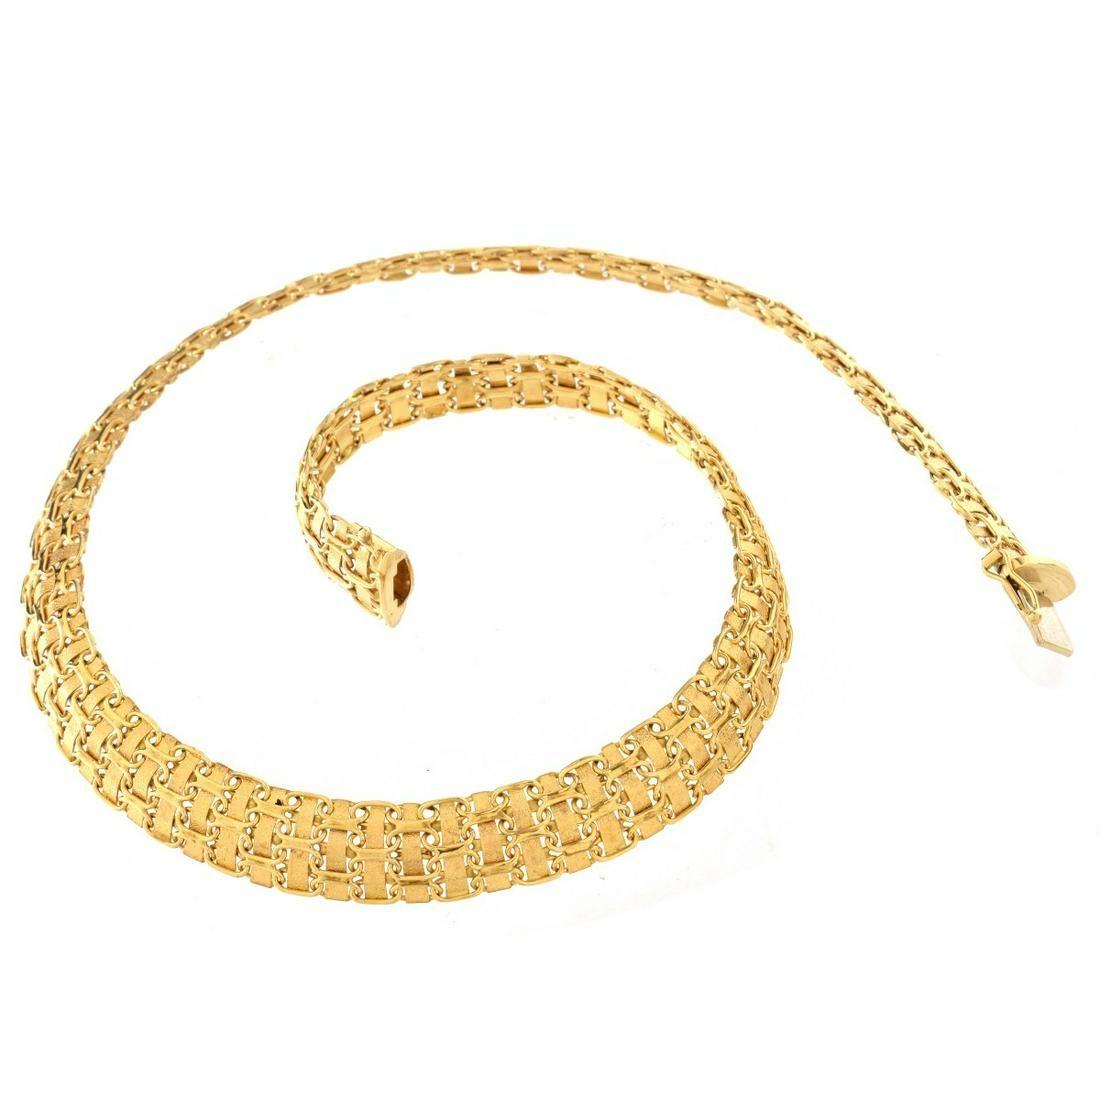 Italian 14K Link Necklace